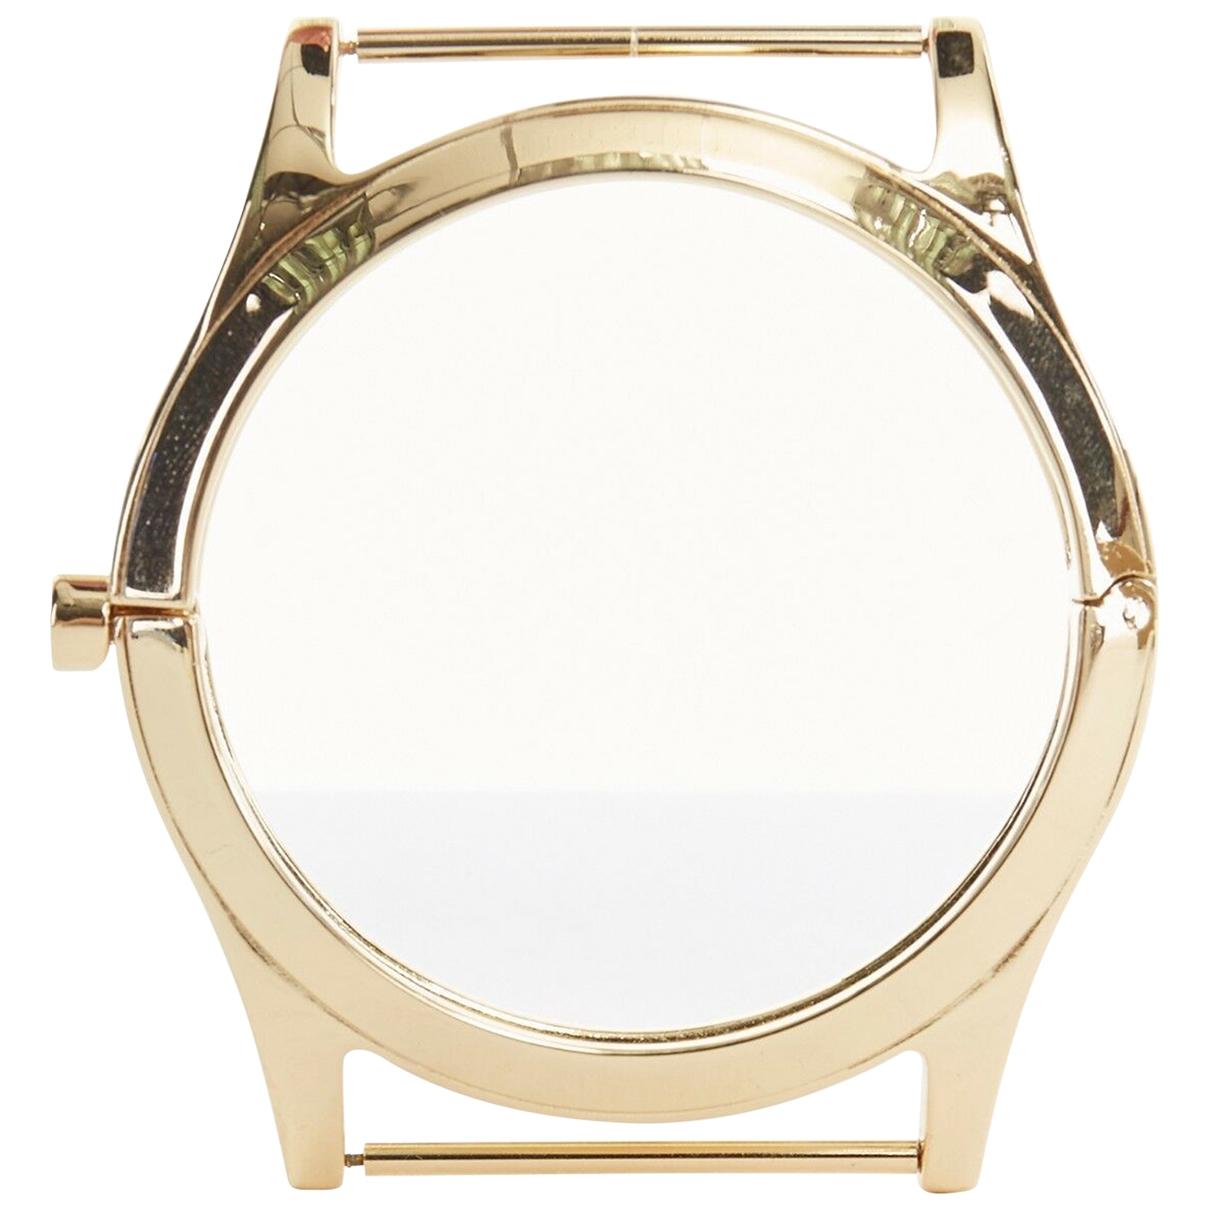 Maison Martin Margiela \N Armband in  Gold Metall